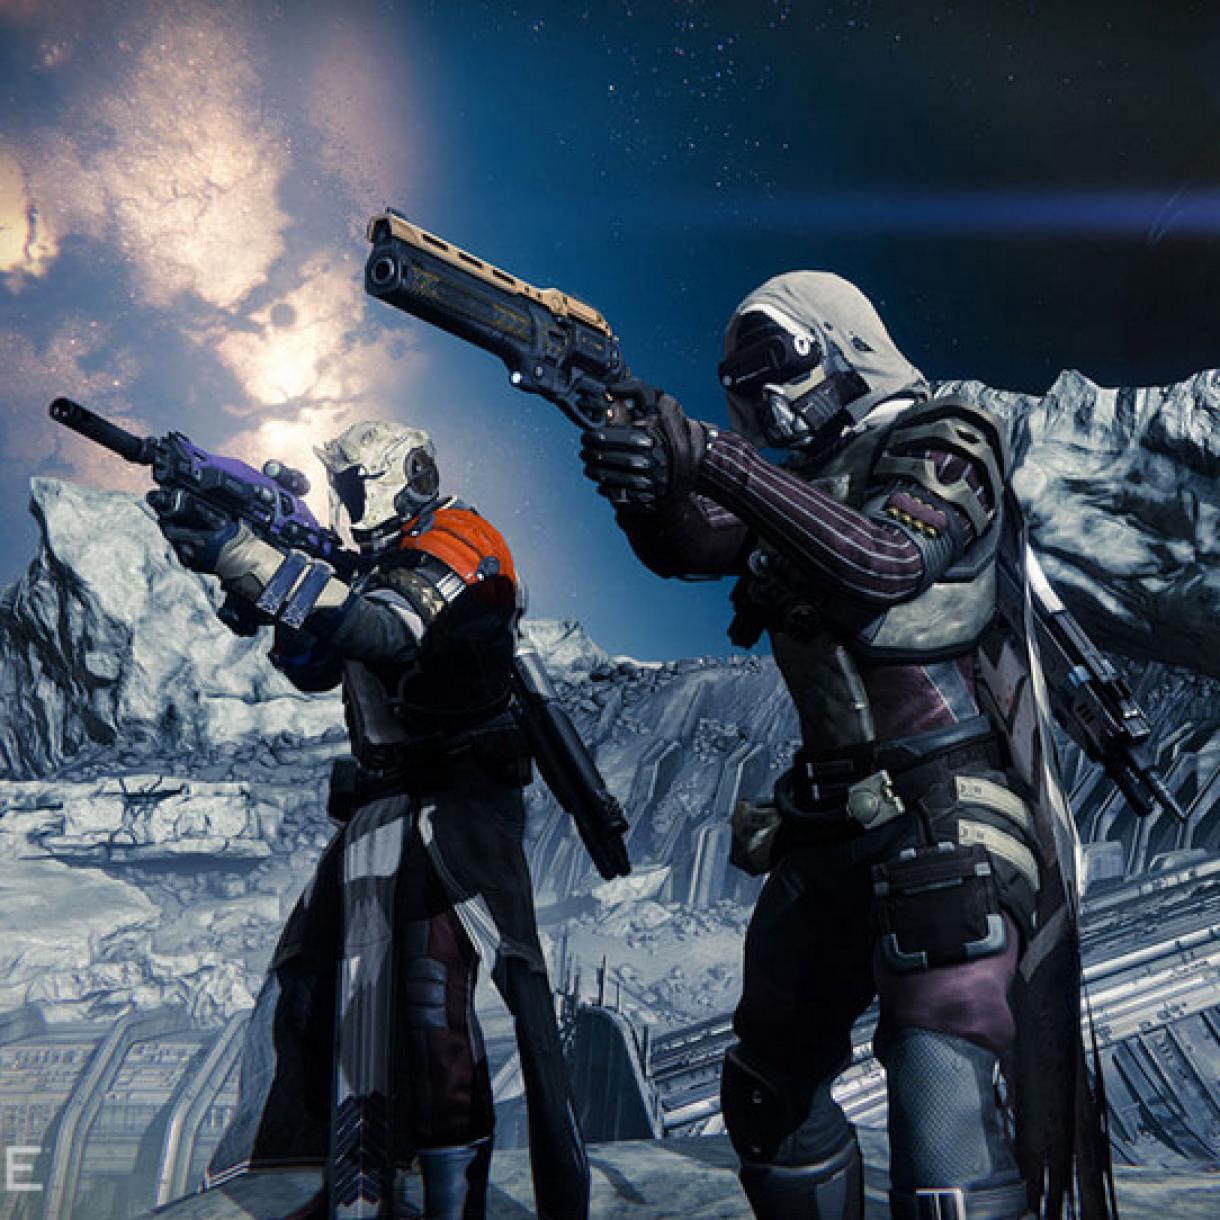 Destiny Reaches 25 Million Registered Users